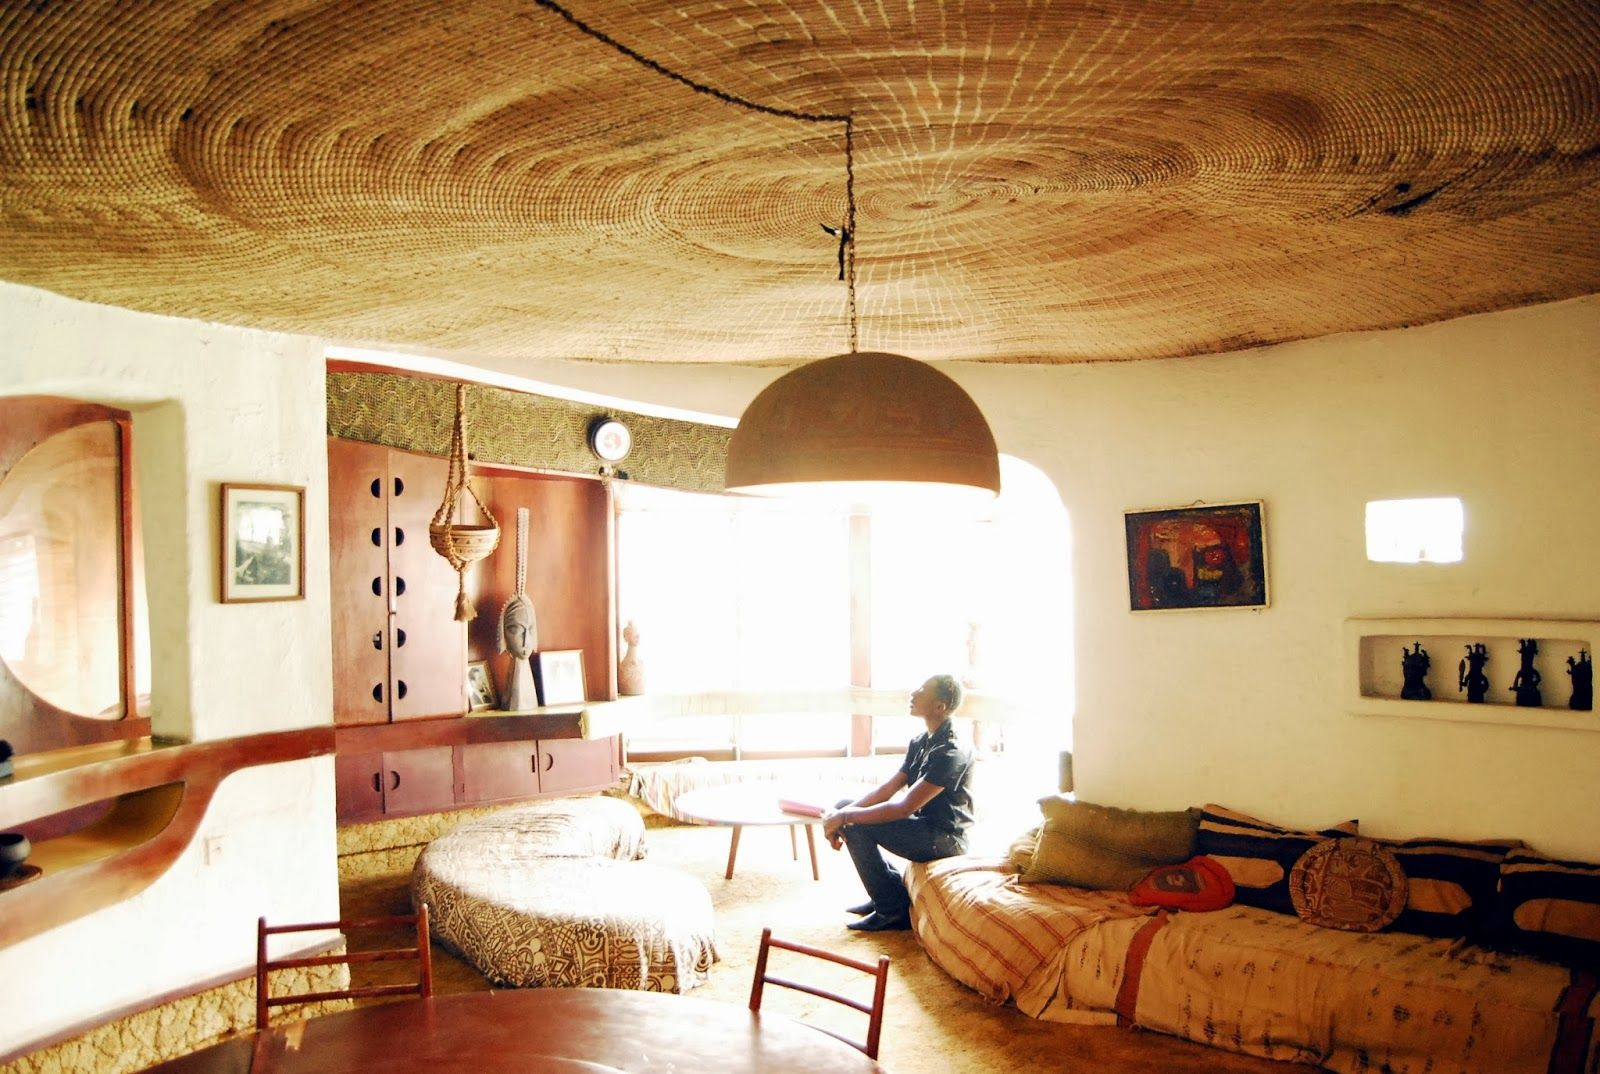 African Modernist Interior Part Of Architect S Alan Vau